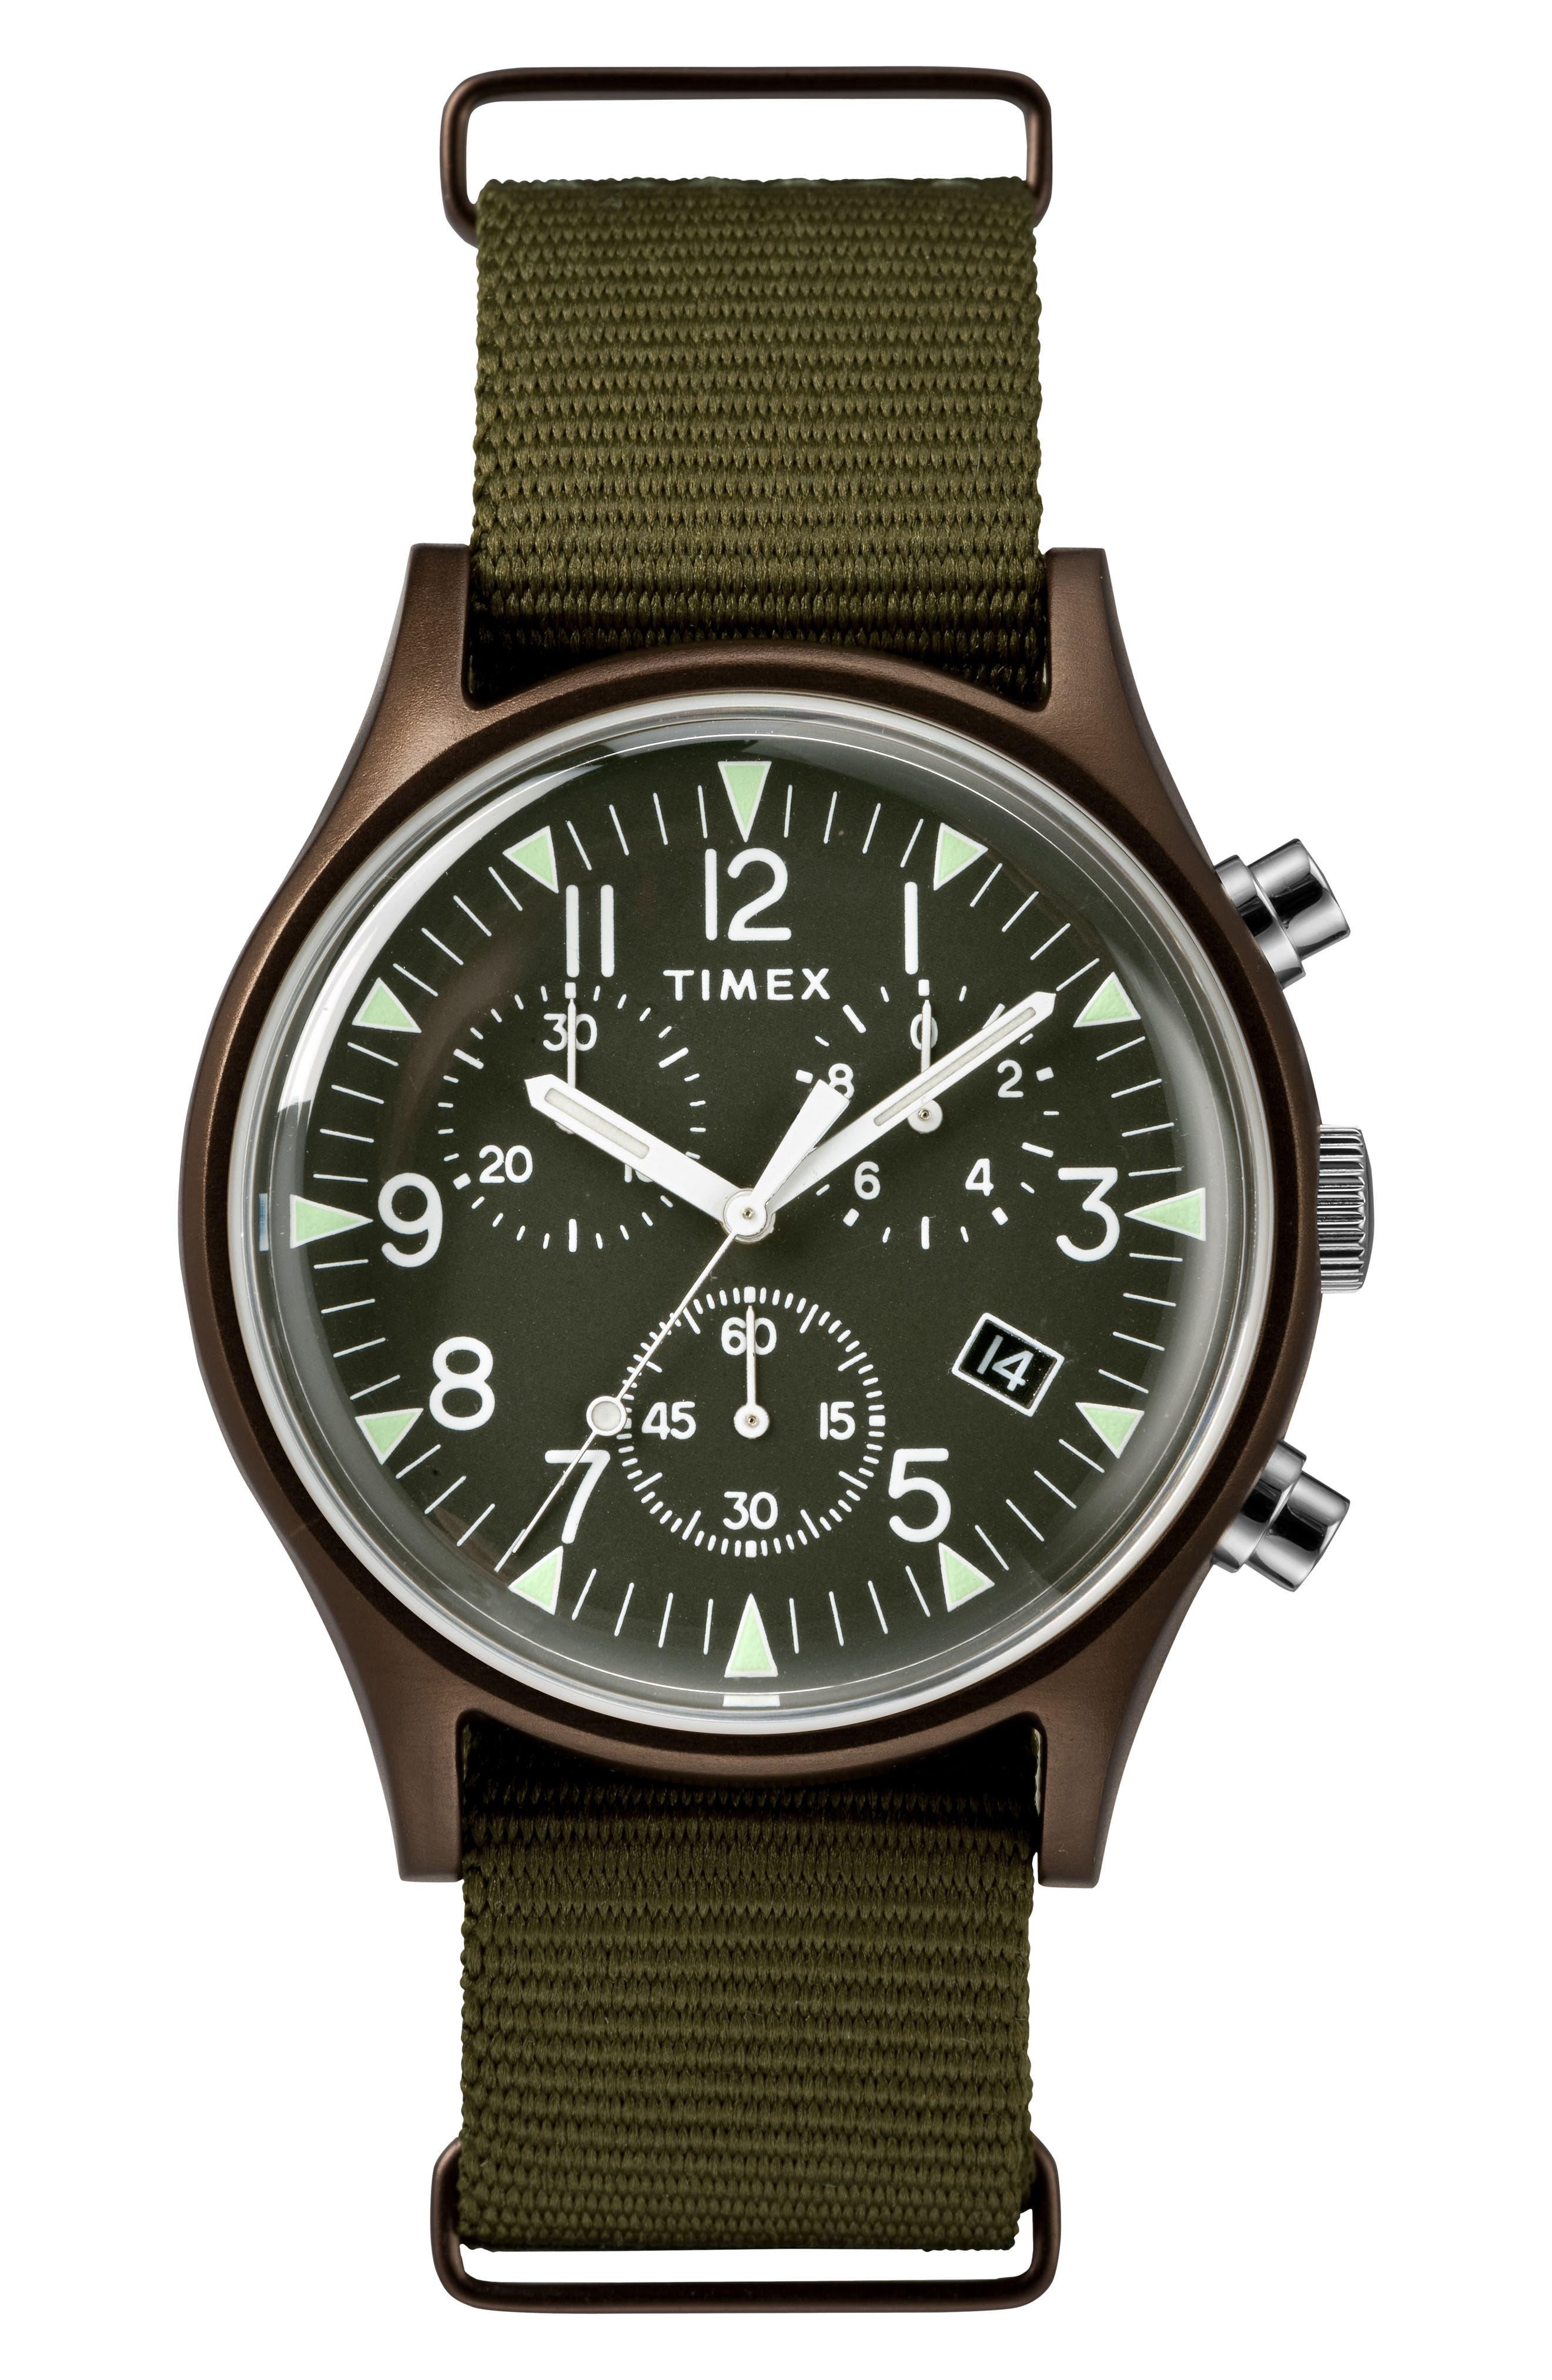 MK1 Chronograph Nylon Strap Watch,                         Main,                         color, OLIVE